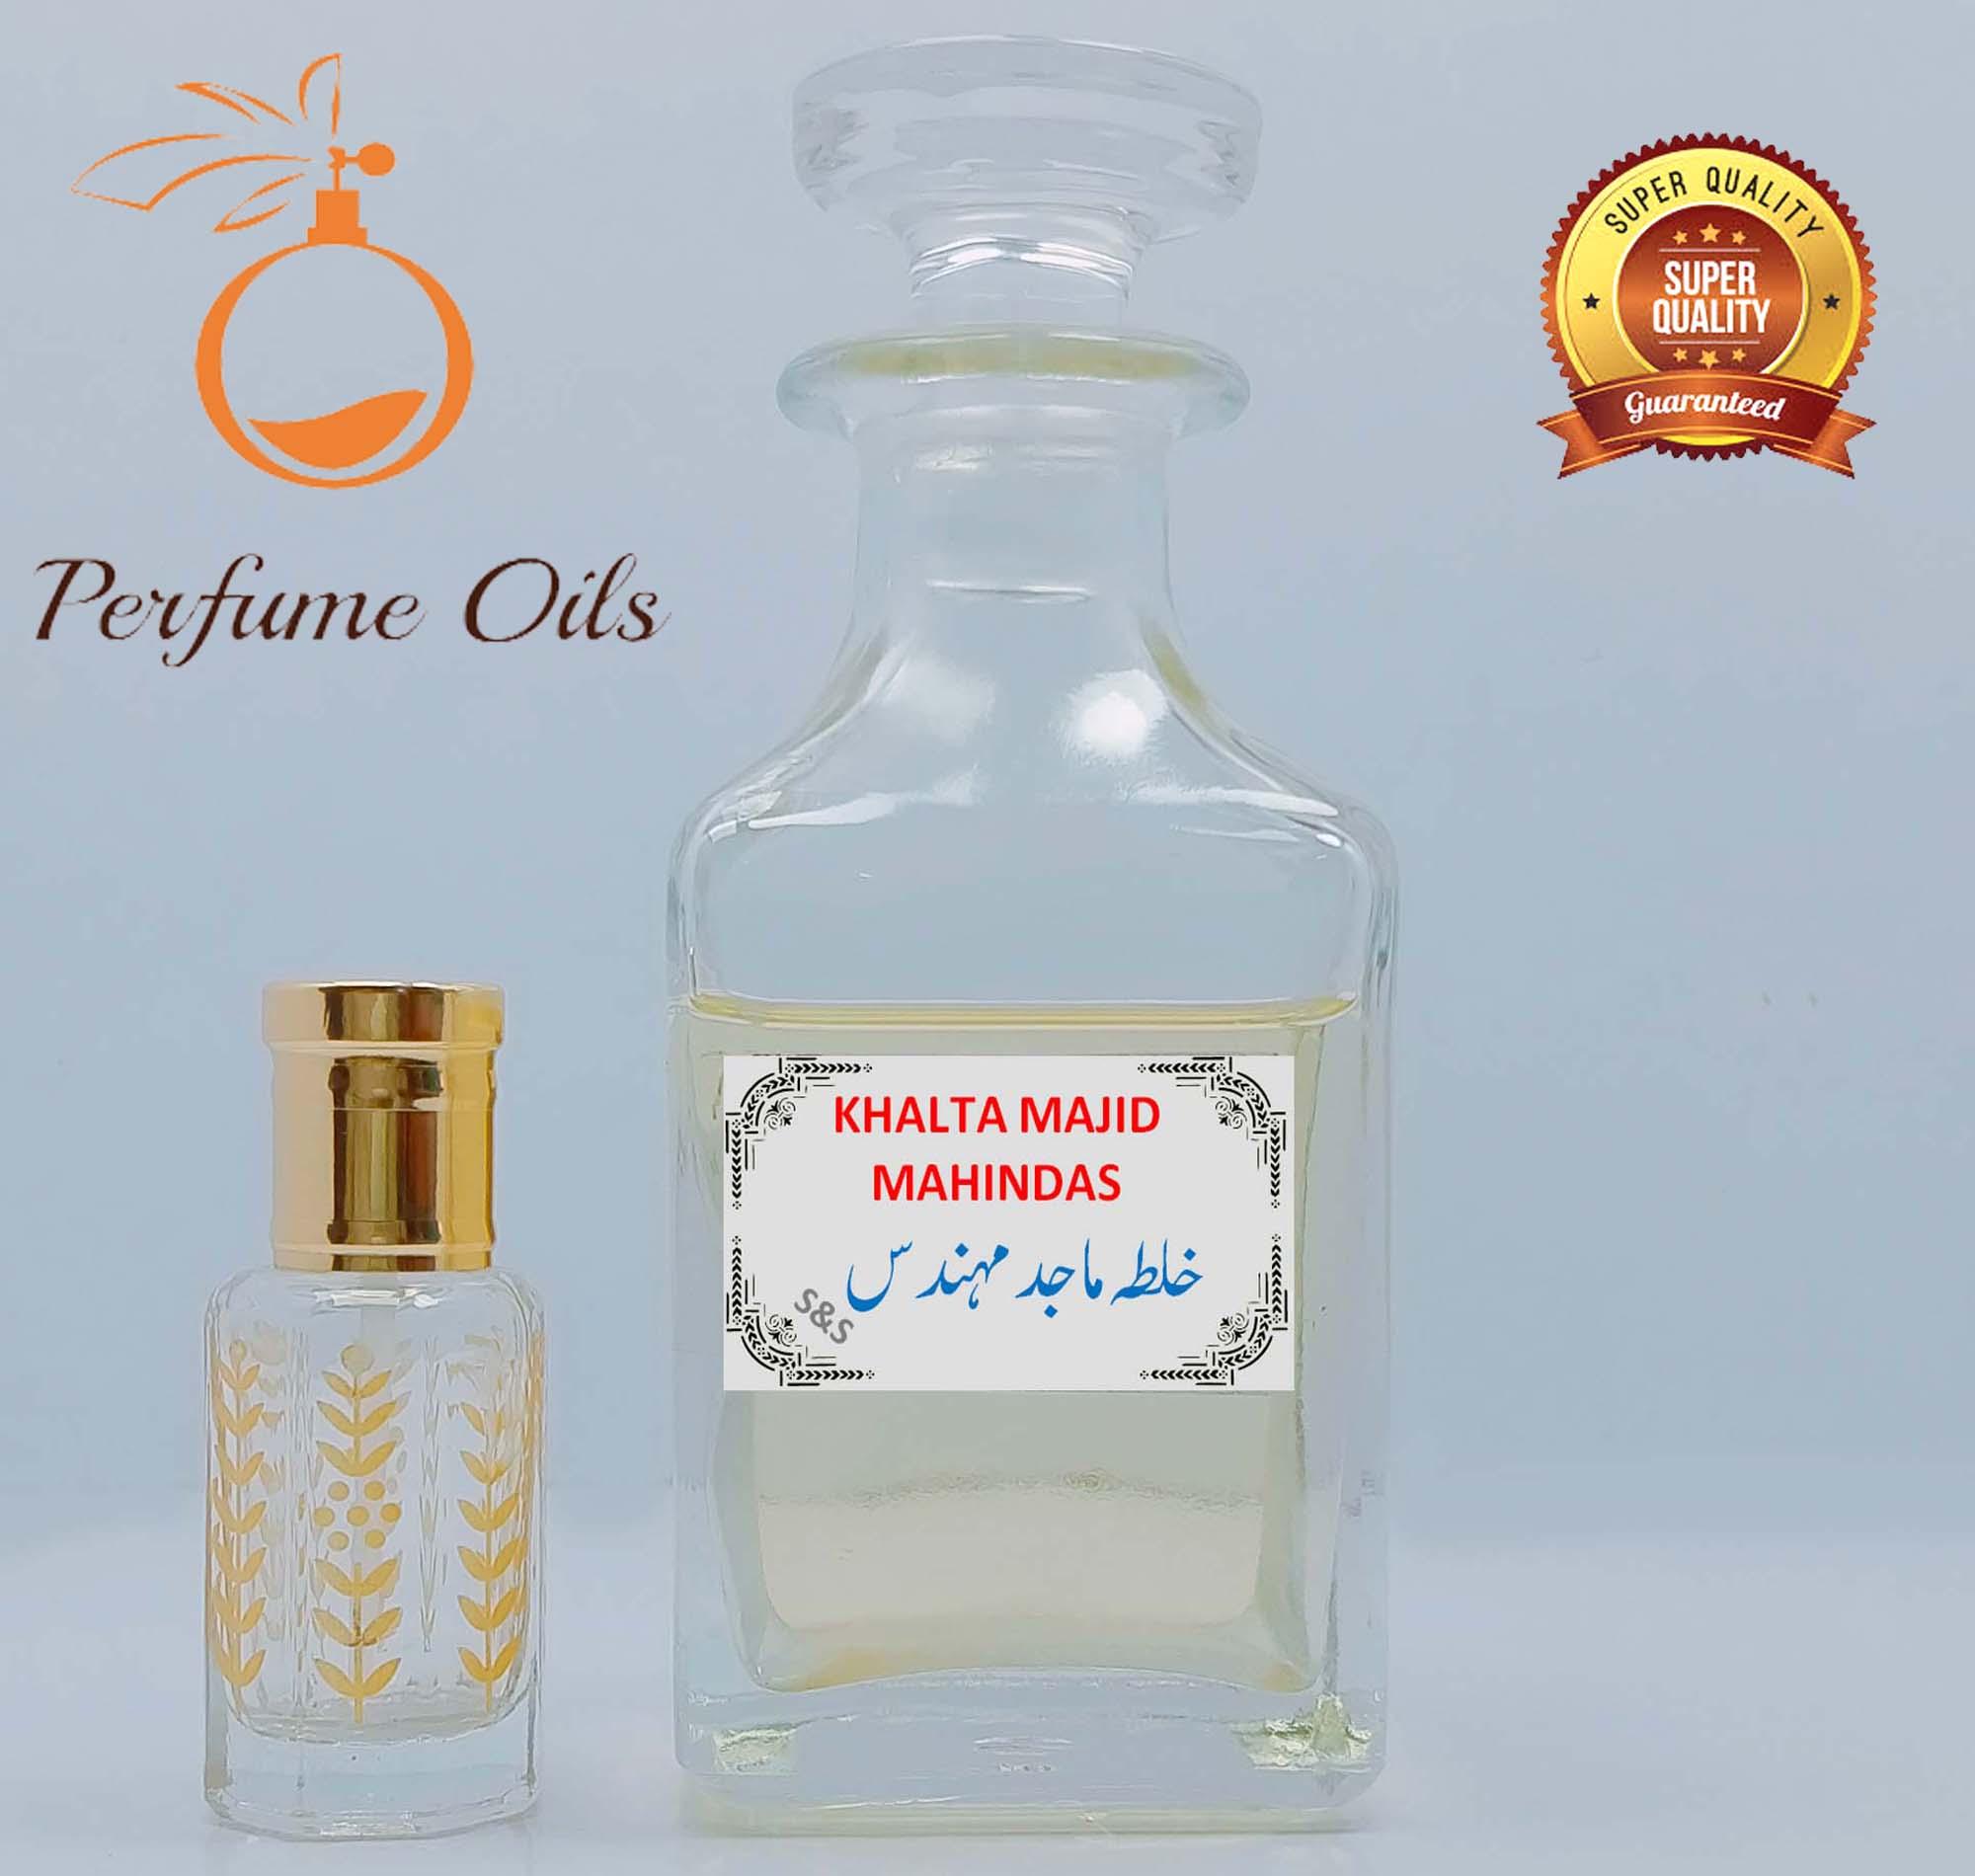 KHALTA MAJID MAHINDAS (S&S) Special Perfume Oil  Attar / Ittar   Best Projection   Long Lasting High Quality Original Fragrance by Perfume Oils Store